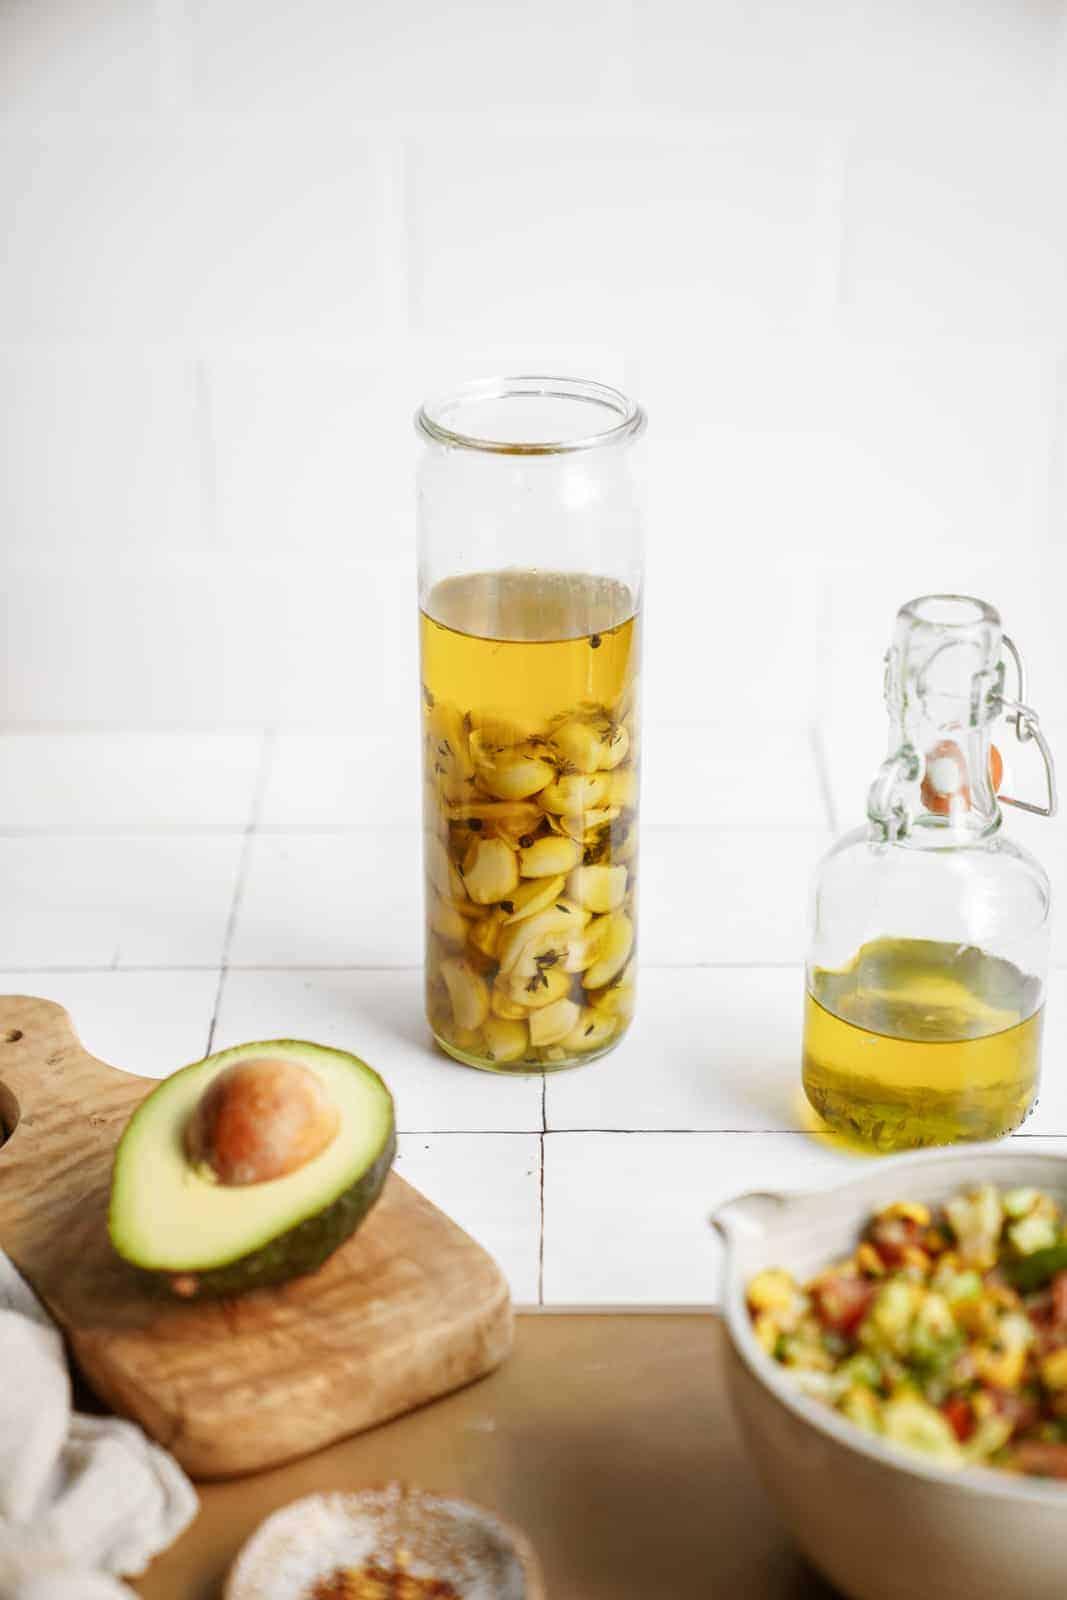 Jar of garlic confit next to a fresh salad and avocado.